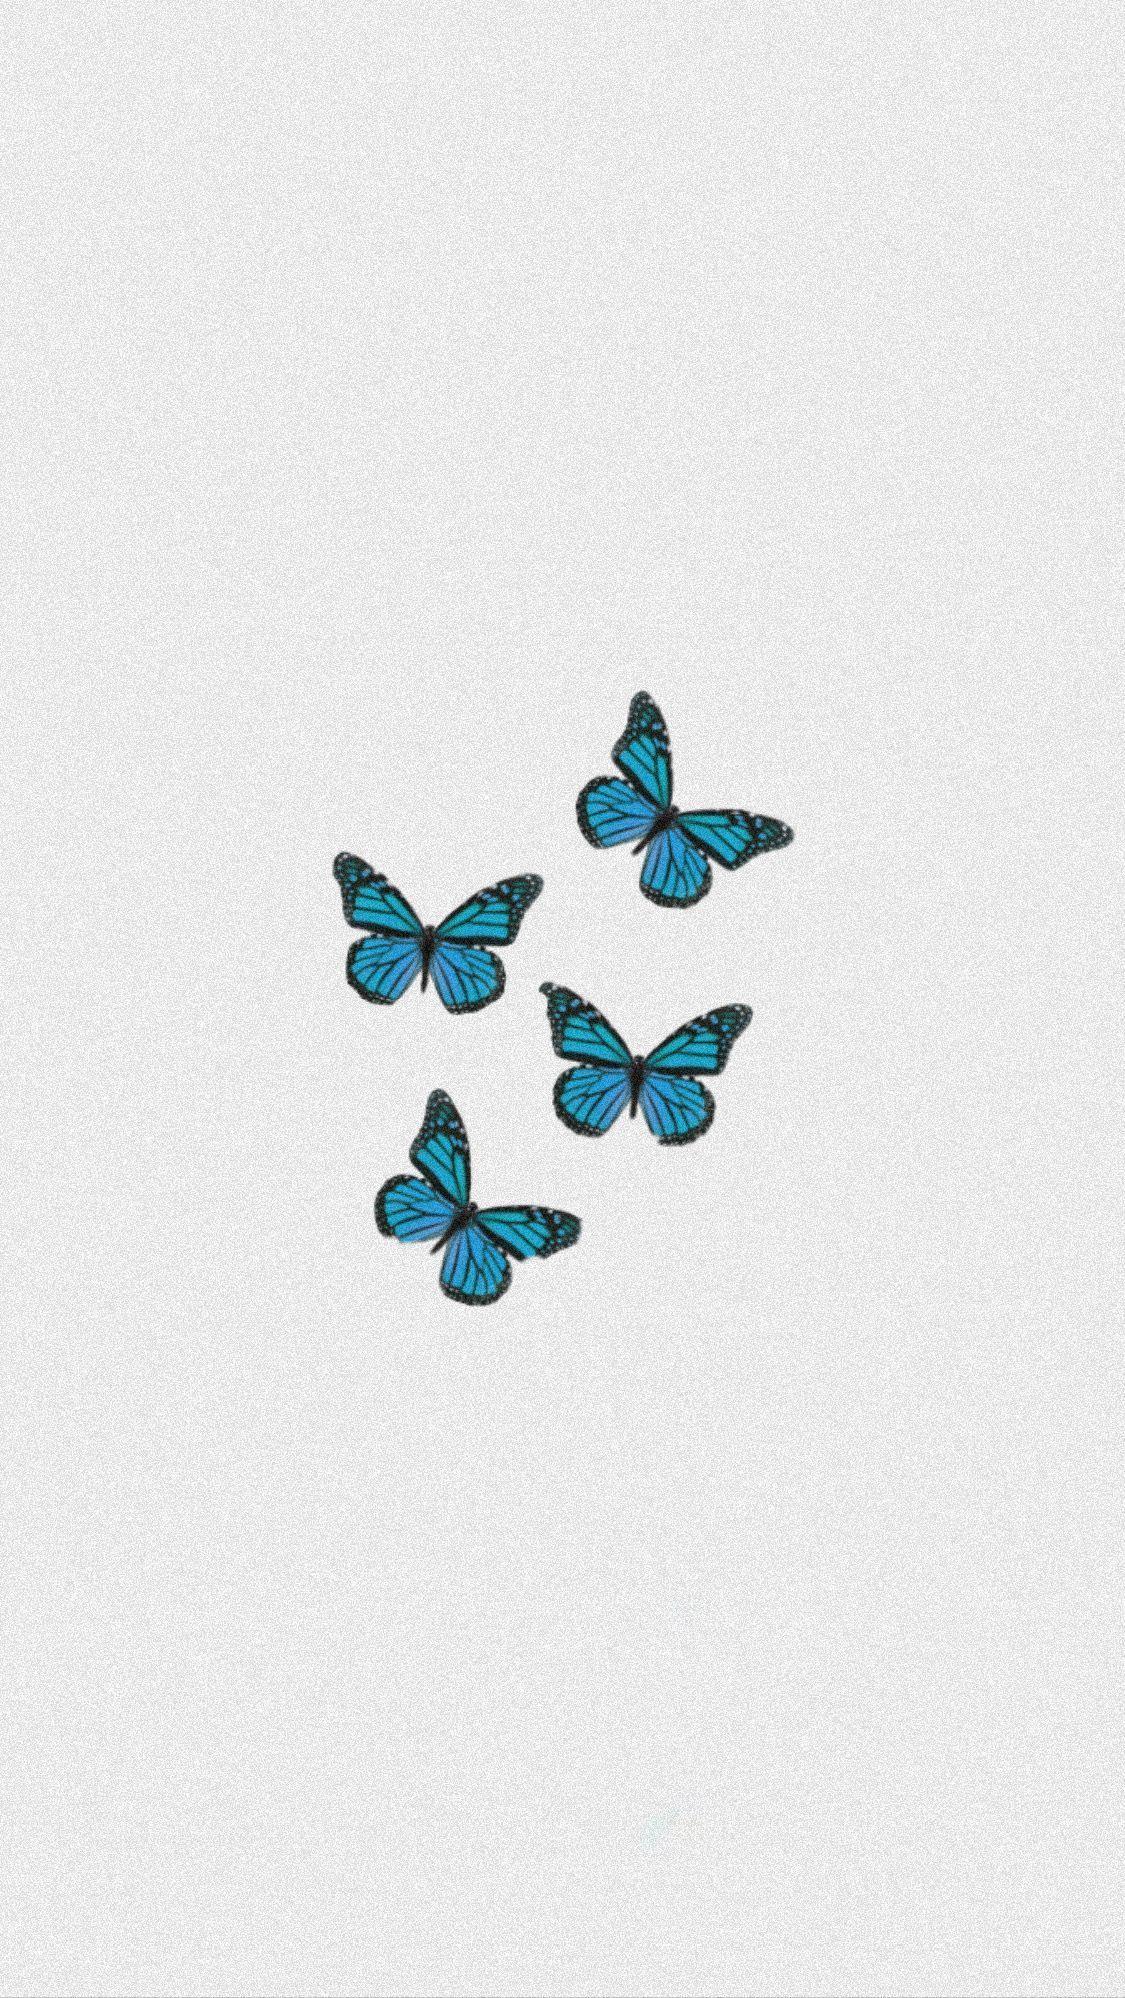 Butterfly Iphone Wallpaper In 2020 Iphone Wallpaper Pattern Butterfly Wallpaper Iphone Aesthetic Iphone Wallpaper